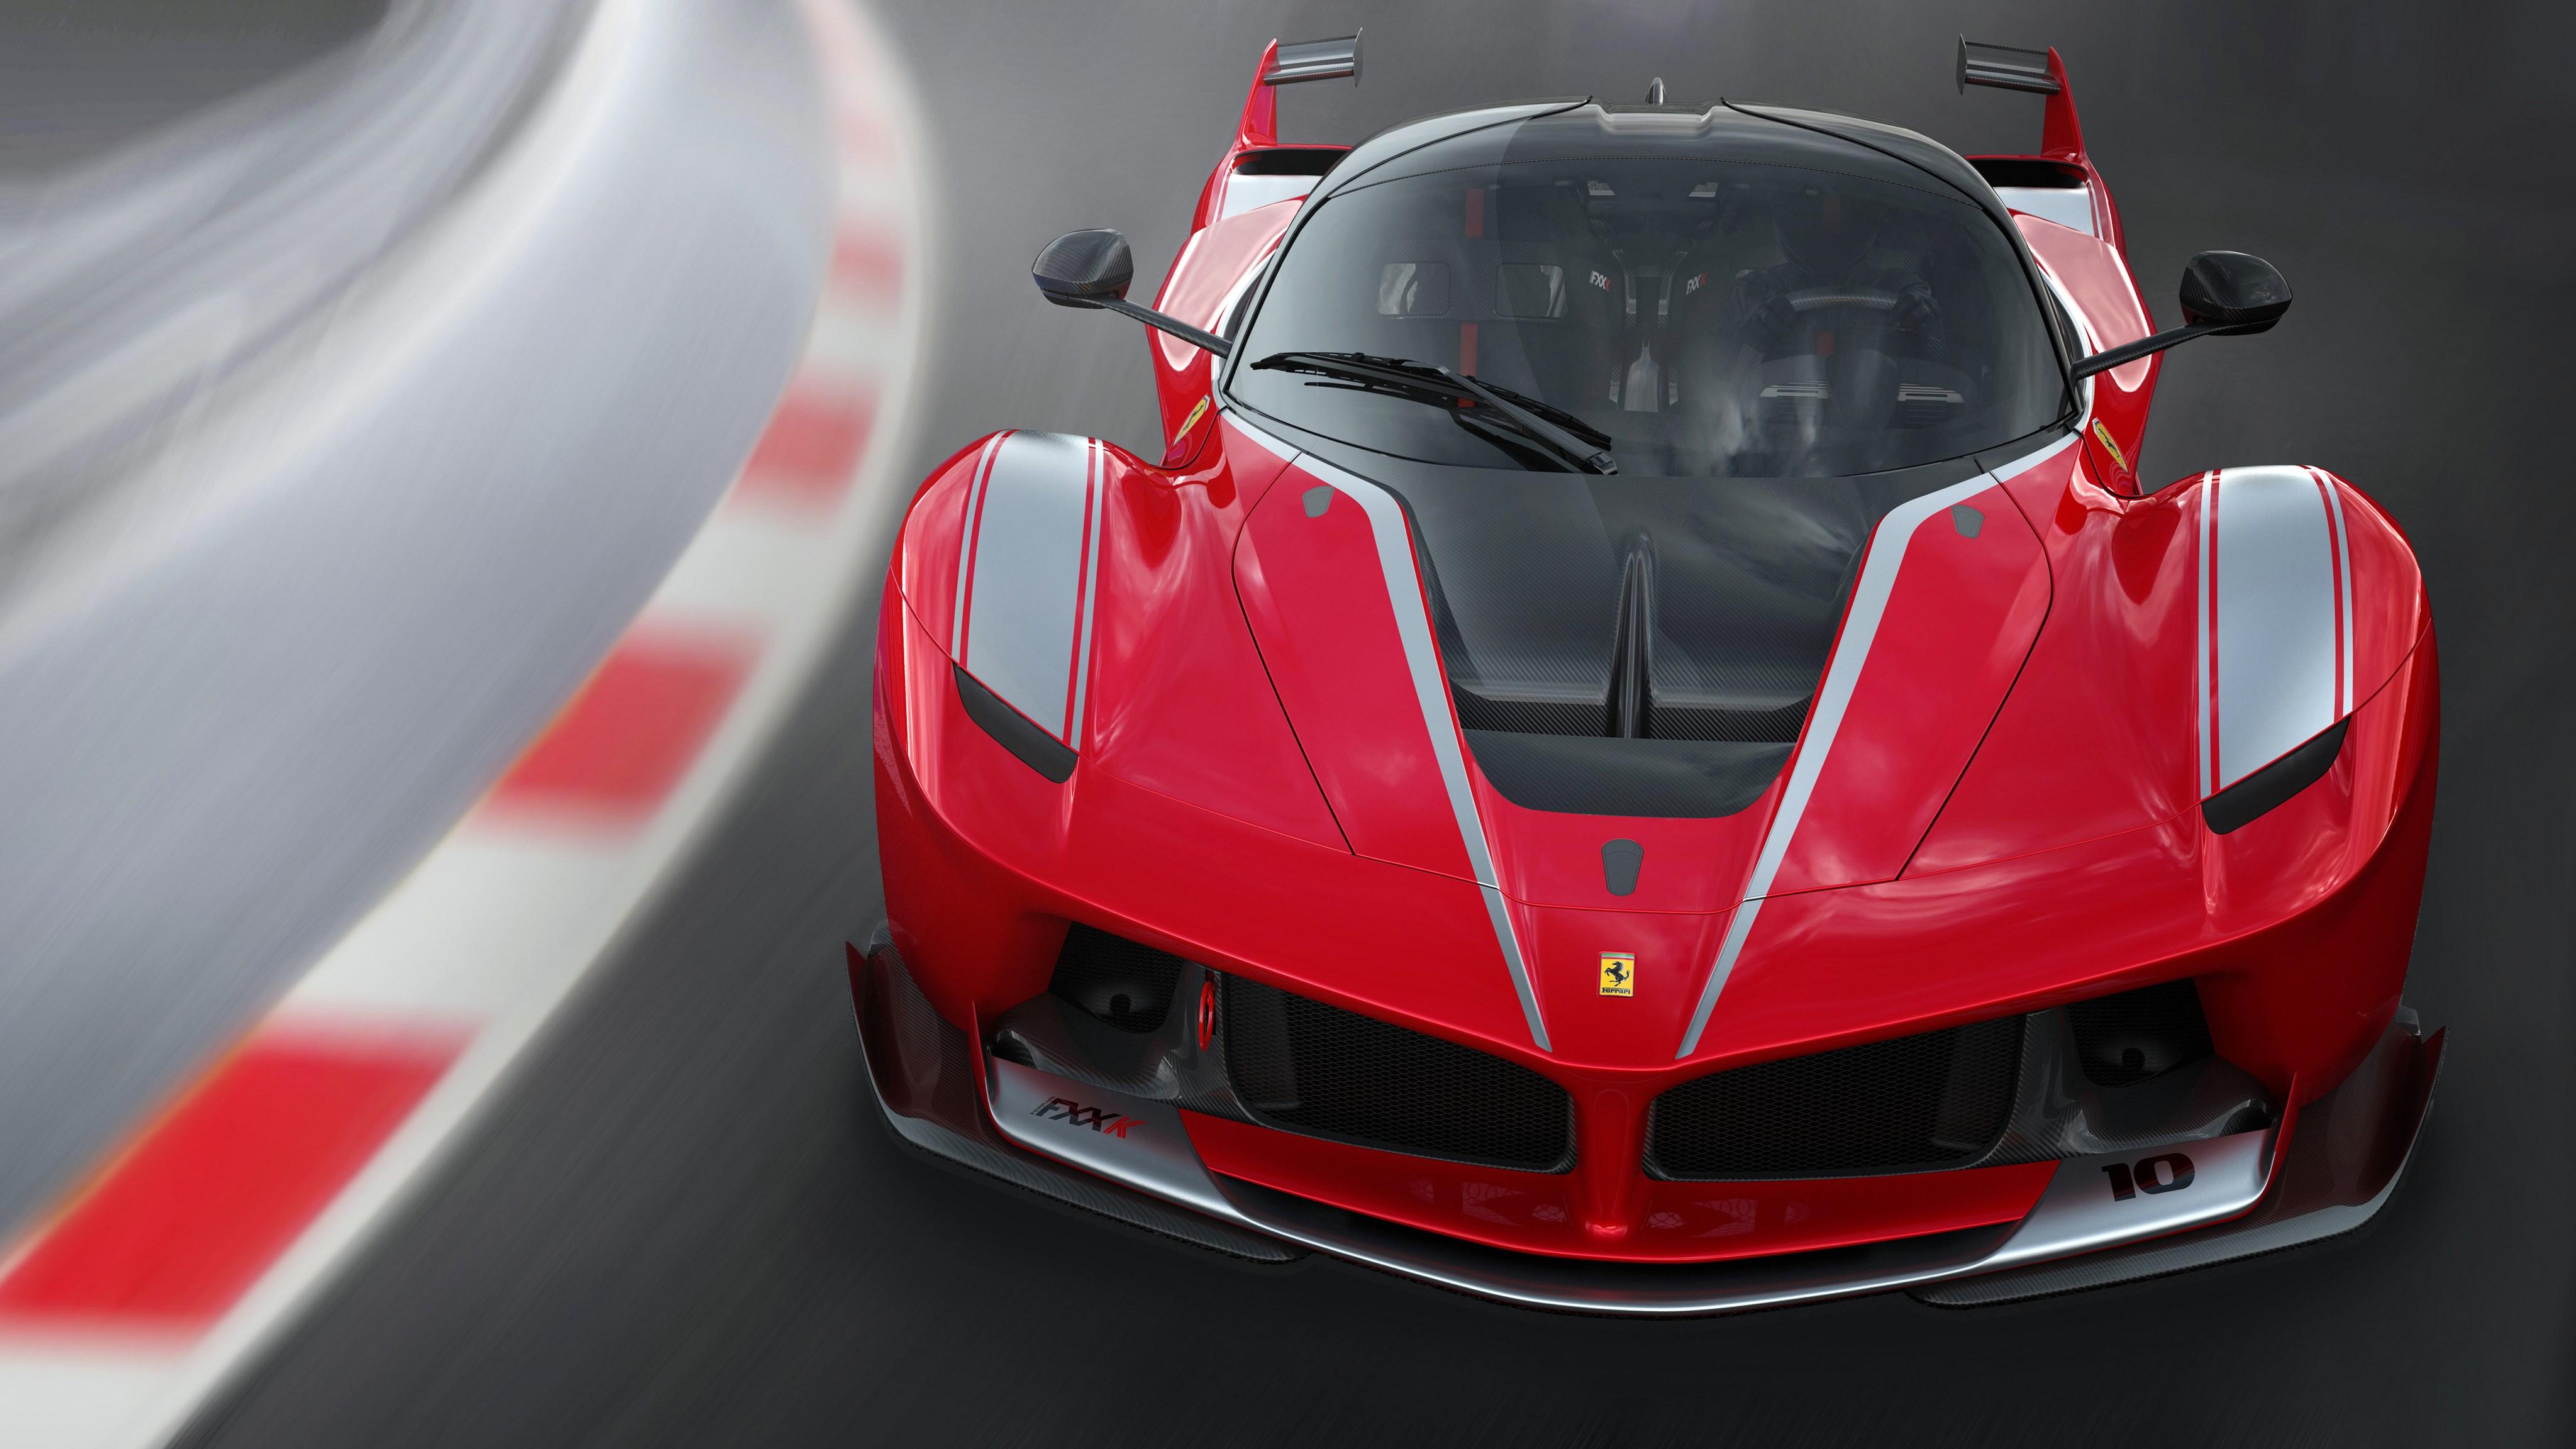 Ferrari fxx k wallpaper